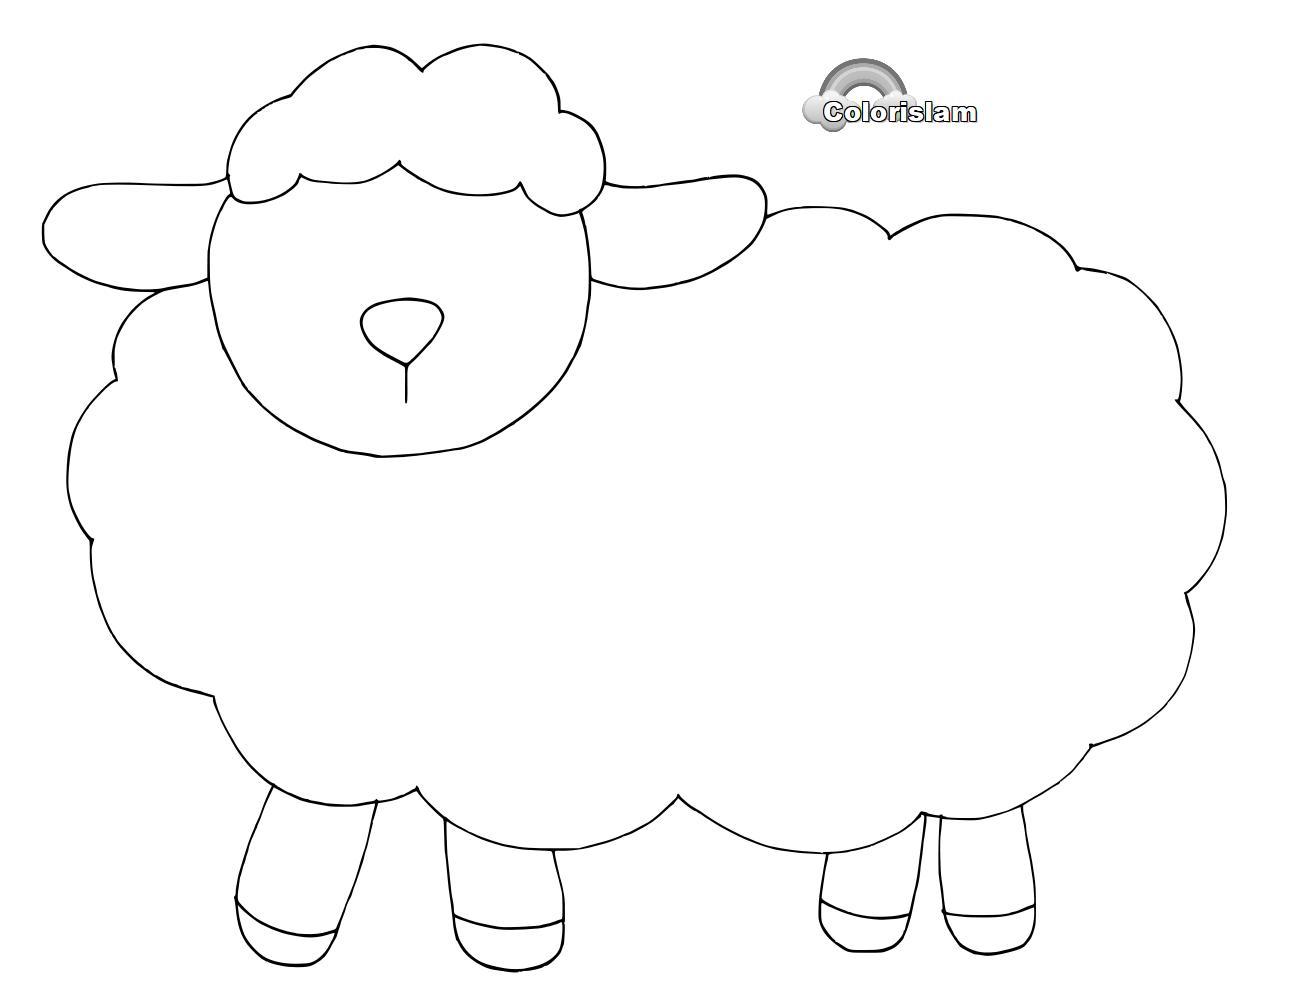 Ramadan et a d colorislam - Dessin mouton rigolo ...